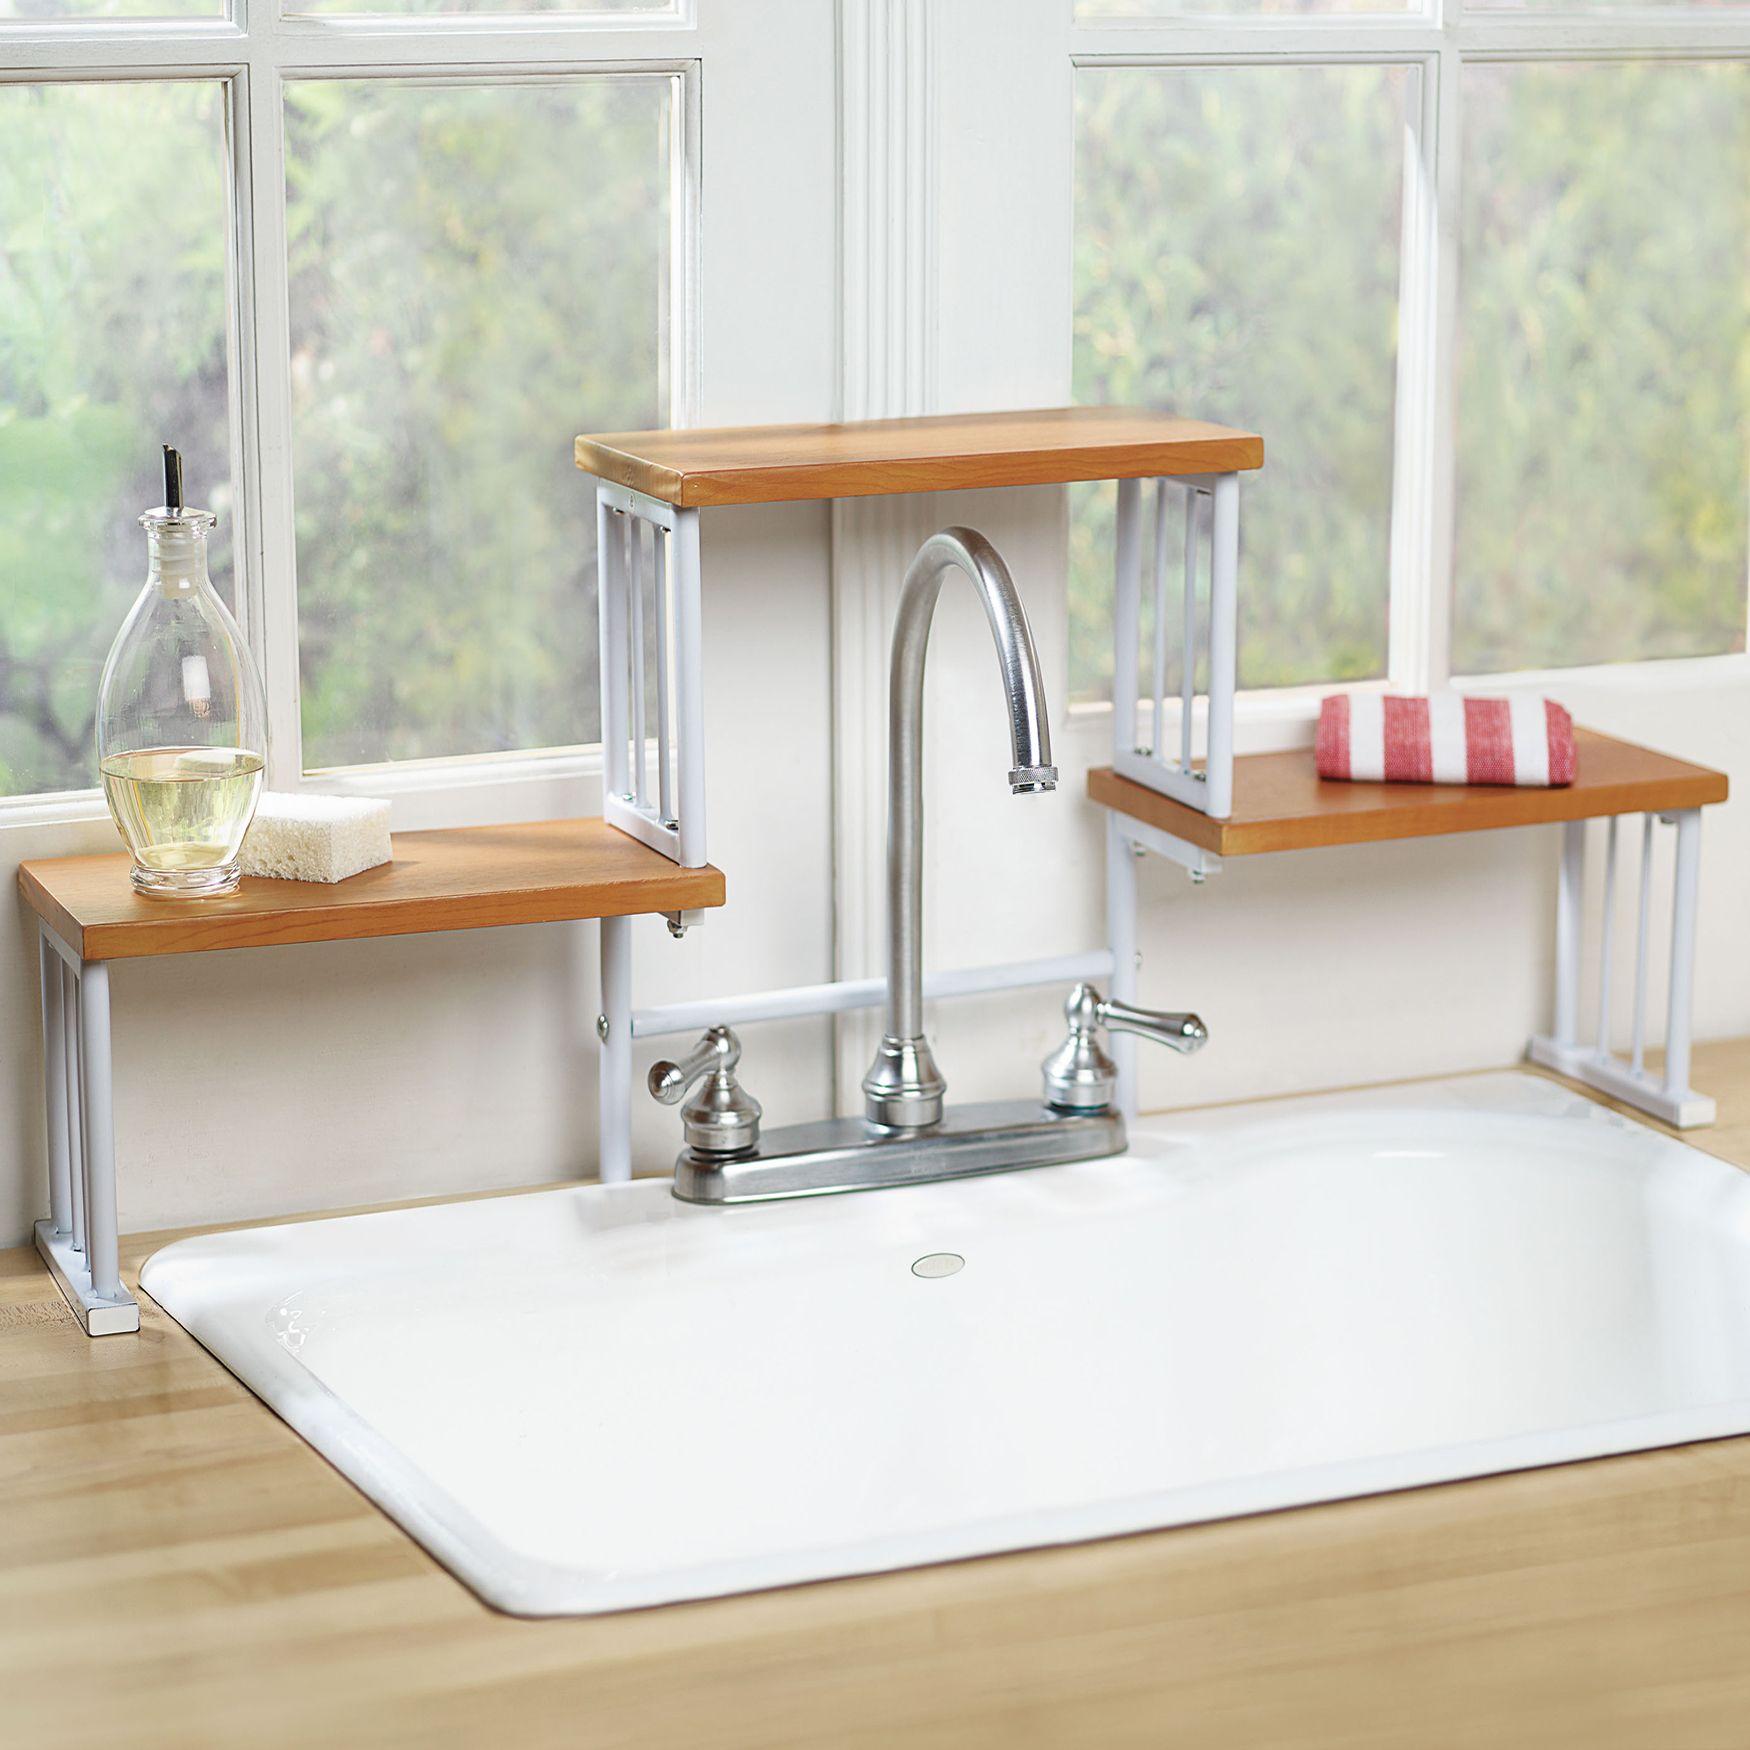 Brylane Home Kitchen: Apartment! Wish/shopping List